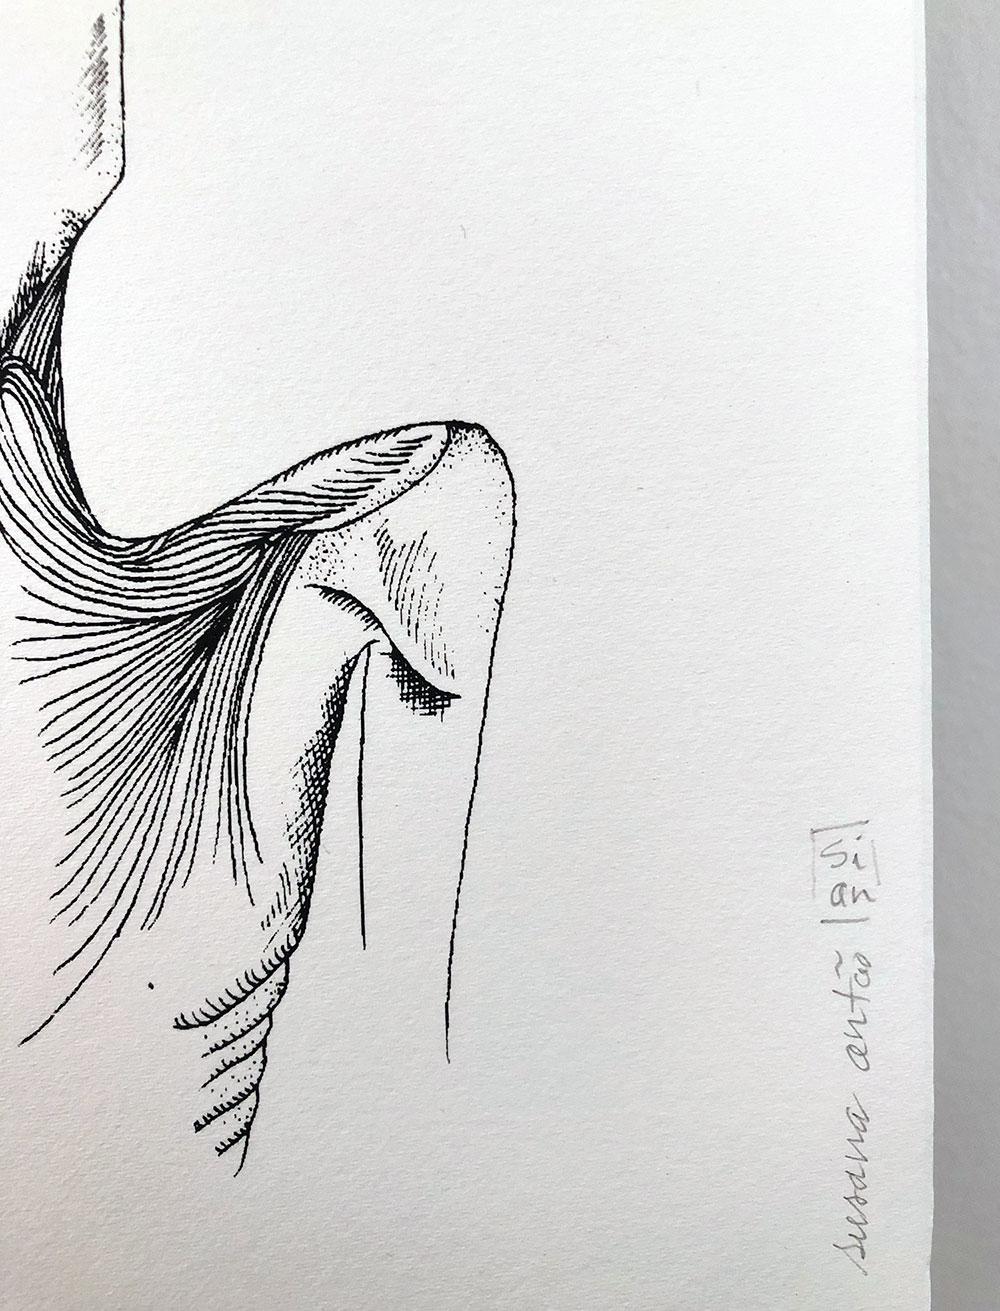 Serigrafia 'Miss' Susana Antão Illustration